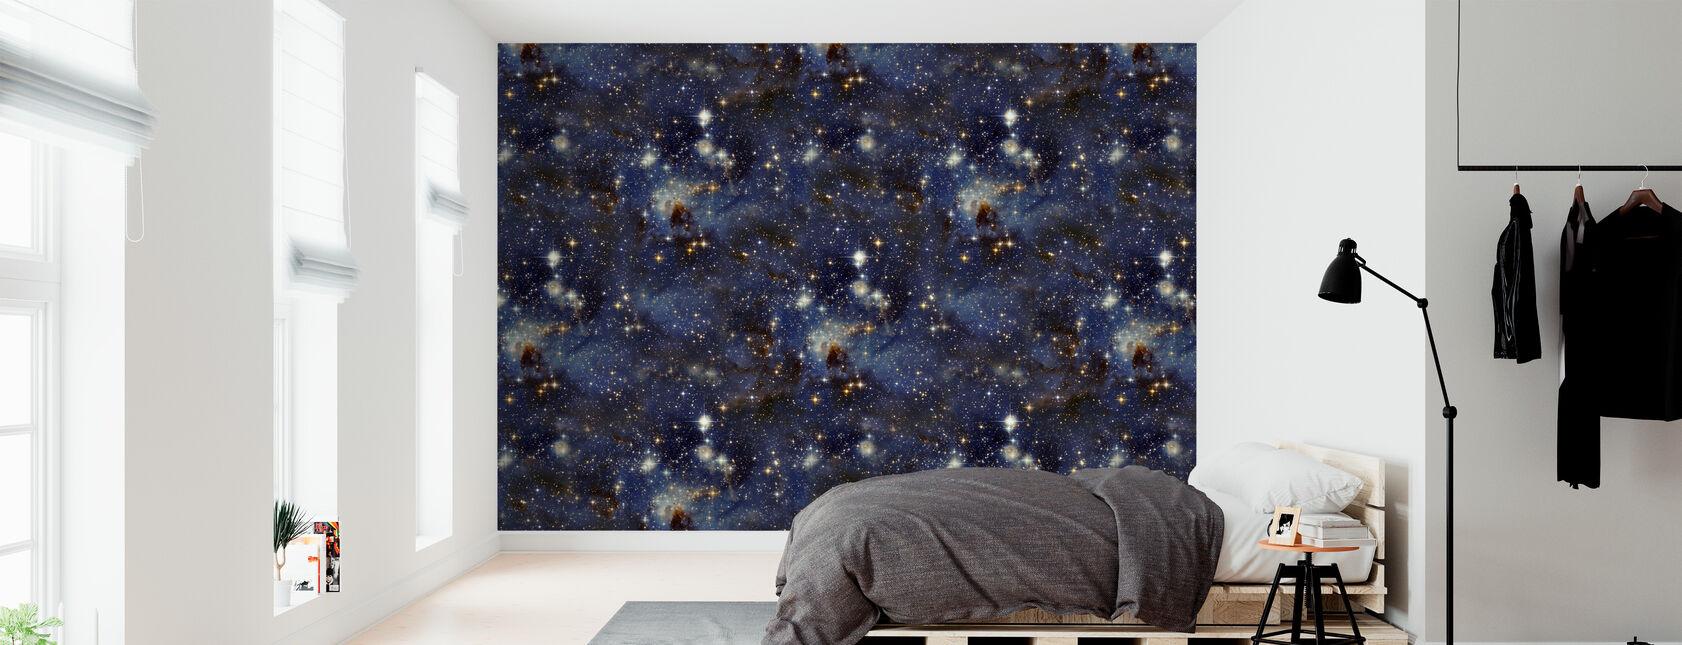 Blue Sky River - Tapet - Soveværelse